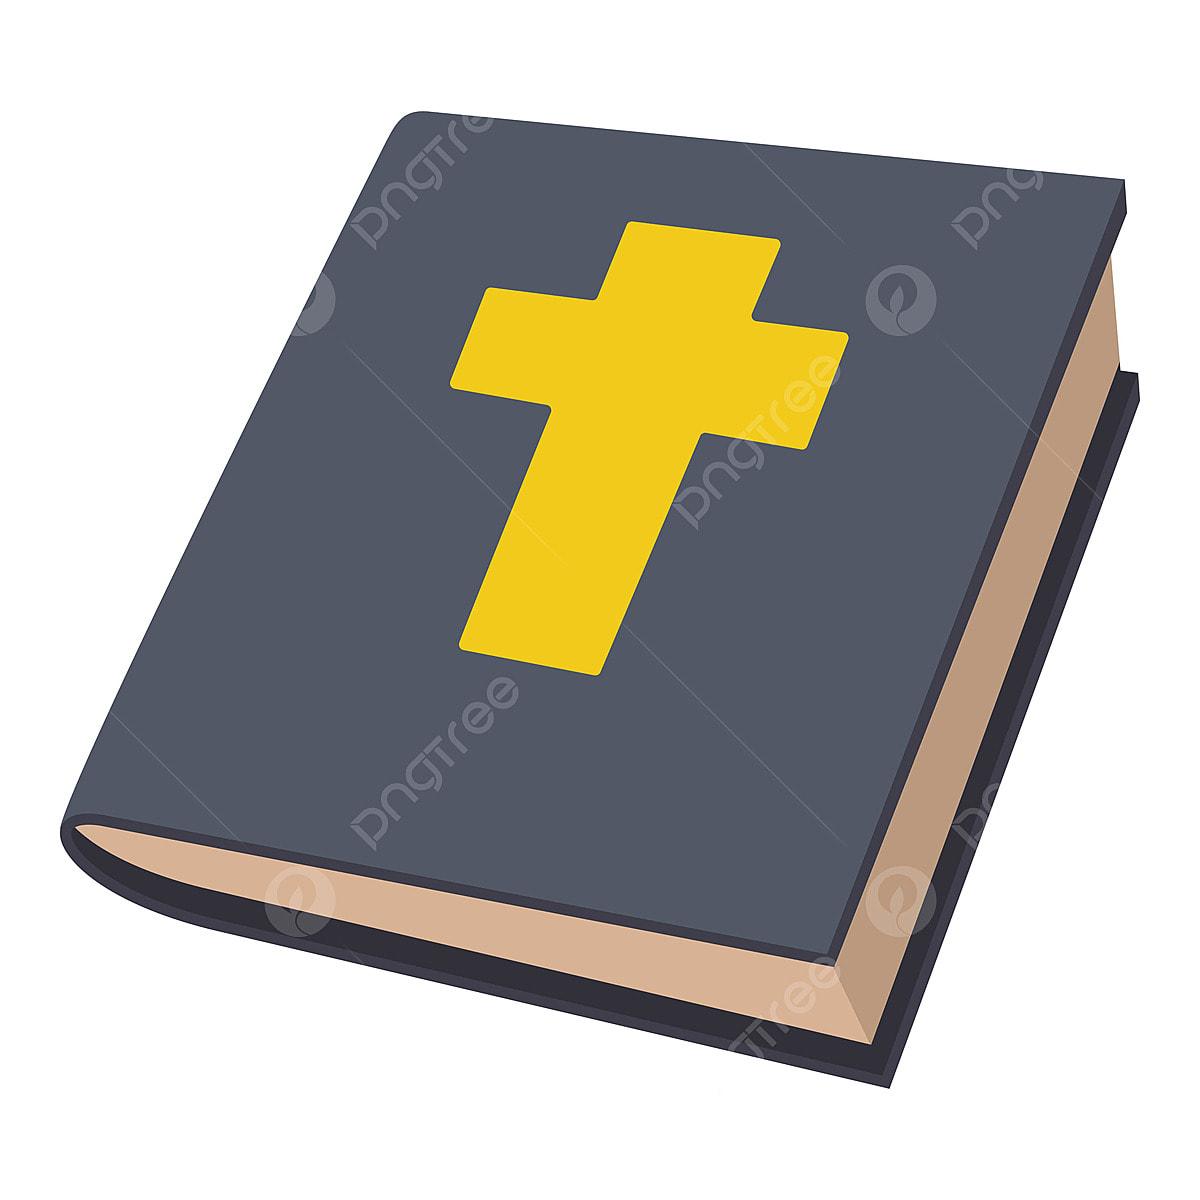 Estilo De Desenho Animado De Icone De Biblia Biblia Icon Cartoon Png E Vetor Para Download Gratuito